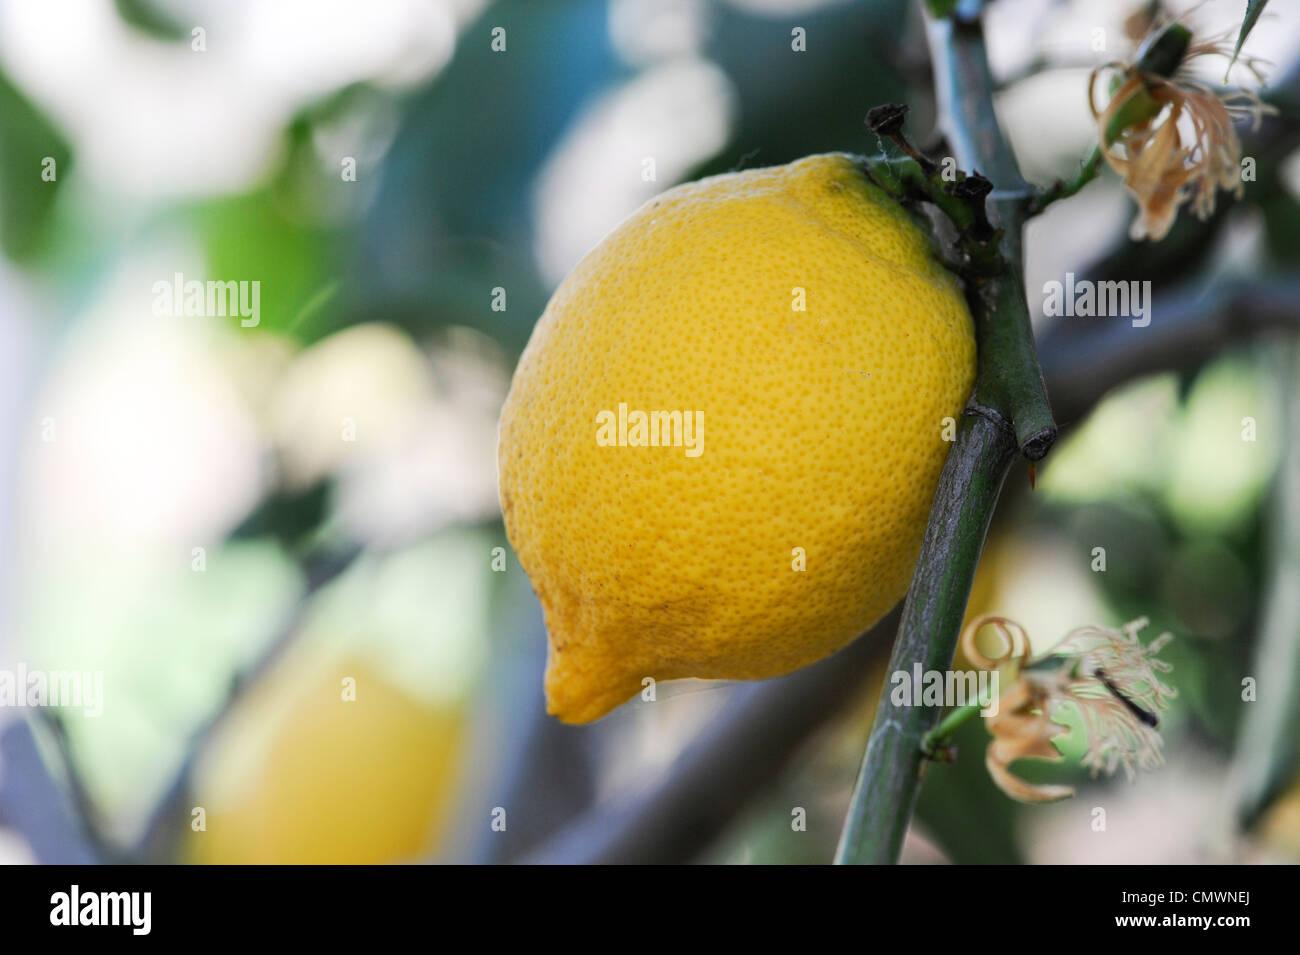 Citrus limon 'four seasons' . Lemon fruit on tree at RHS Wisley gardens, Surrey, UK - Stock Image